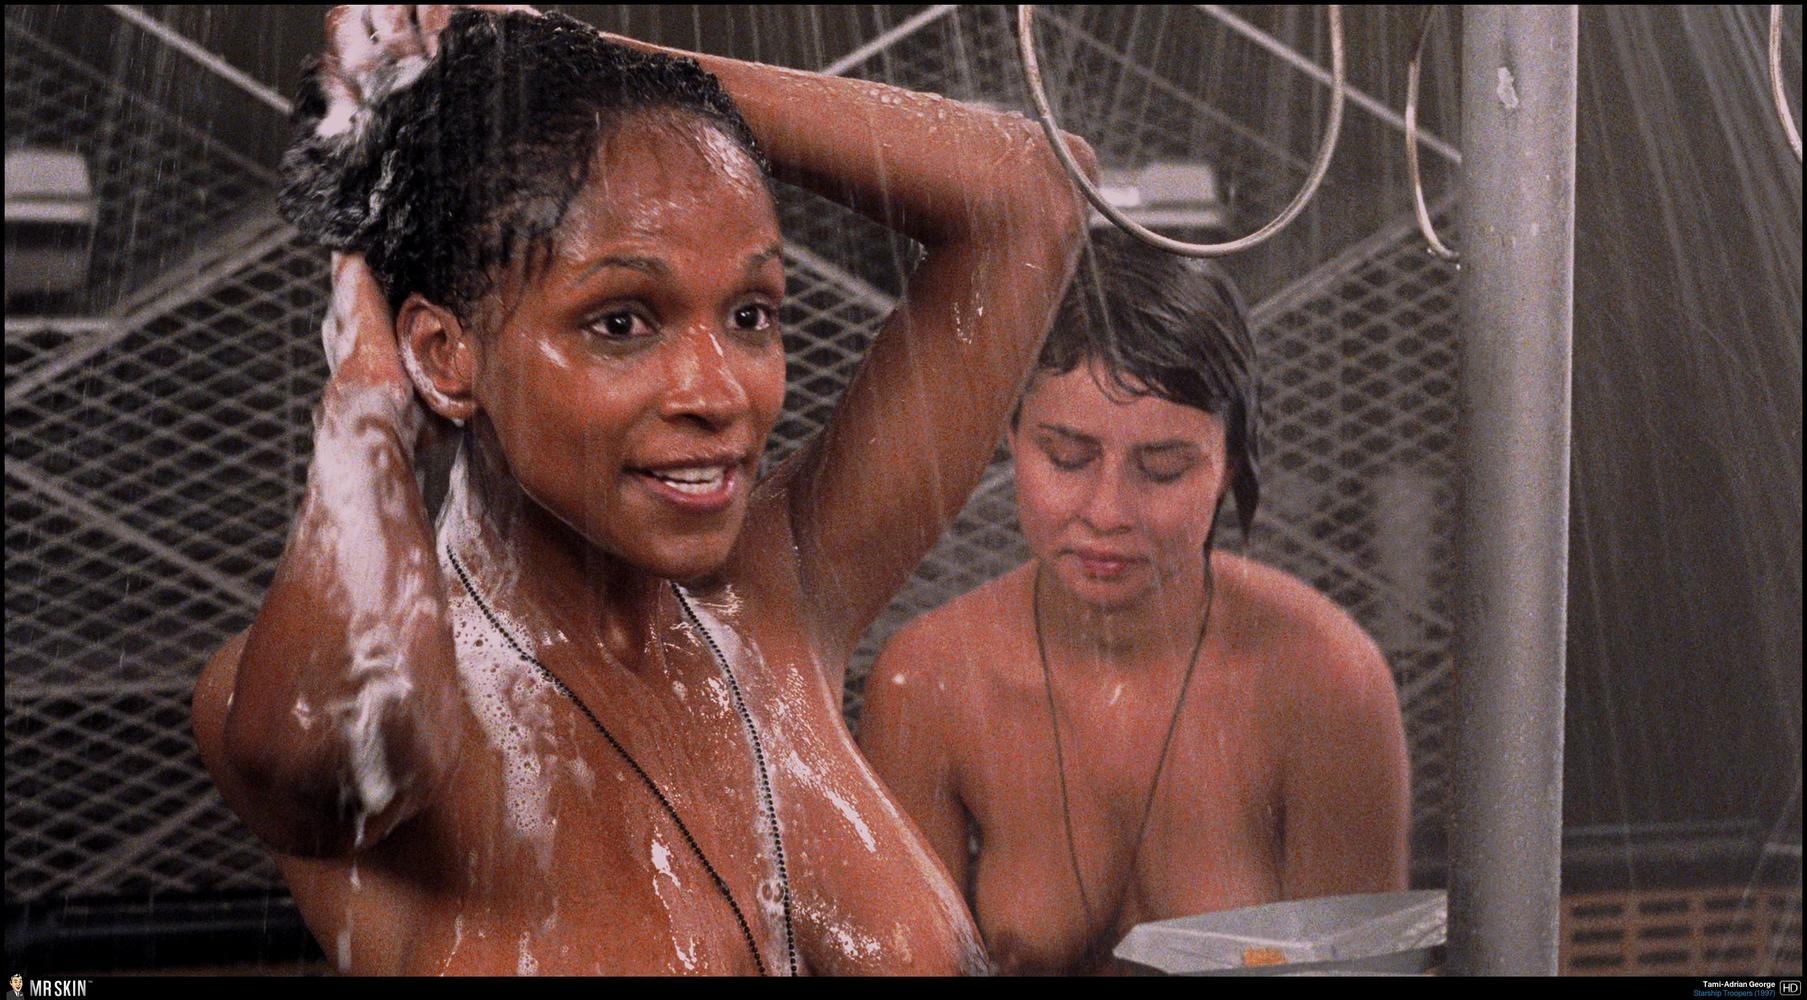 Starship troopers coed shower scene